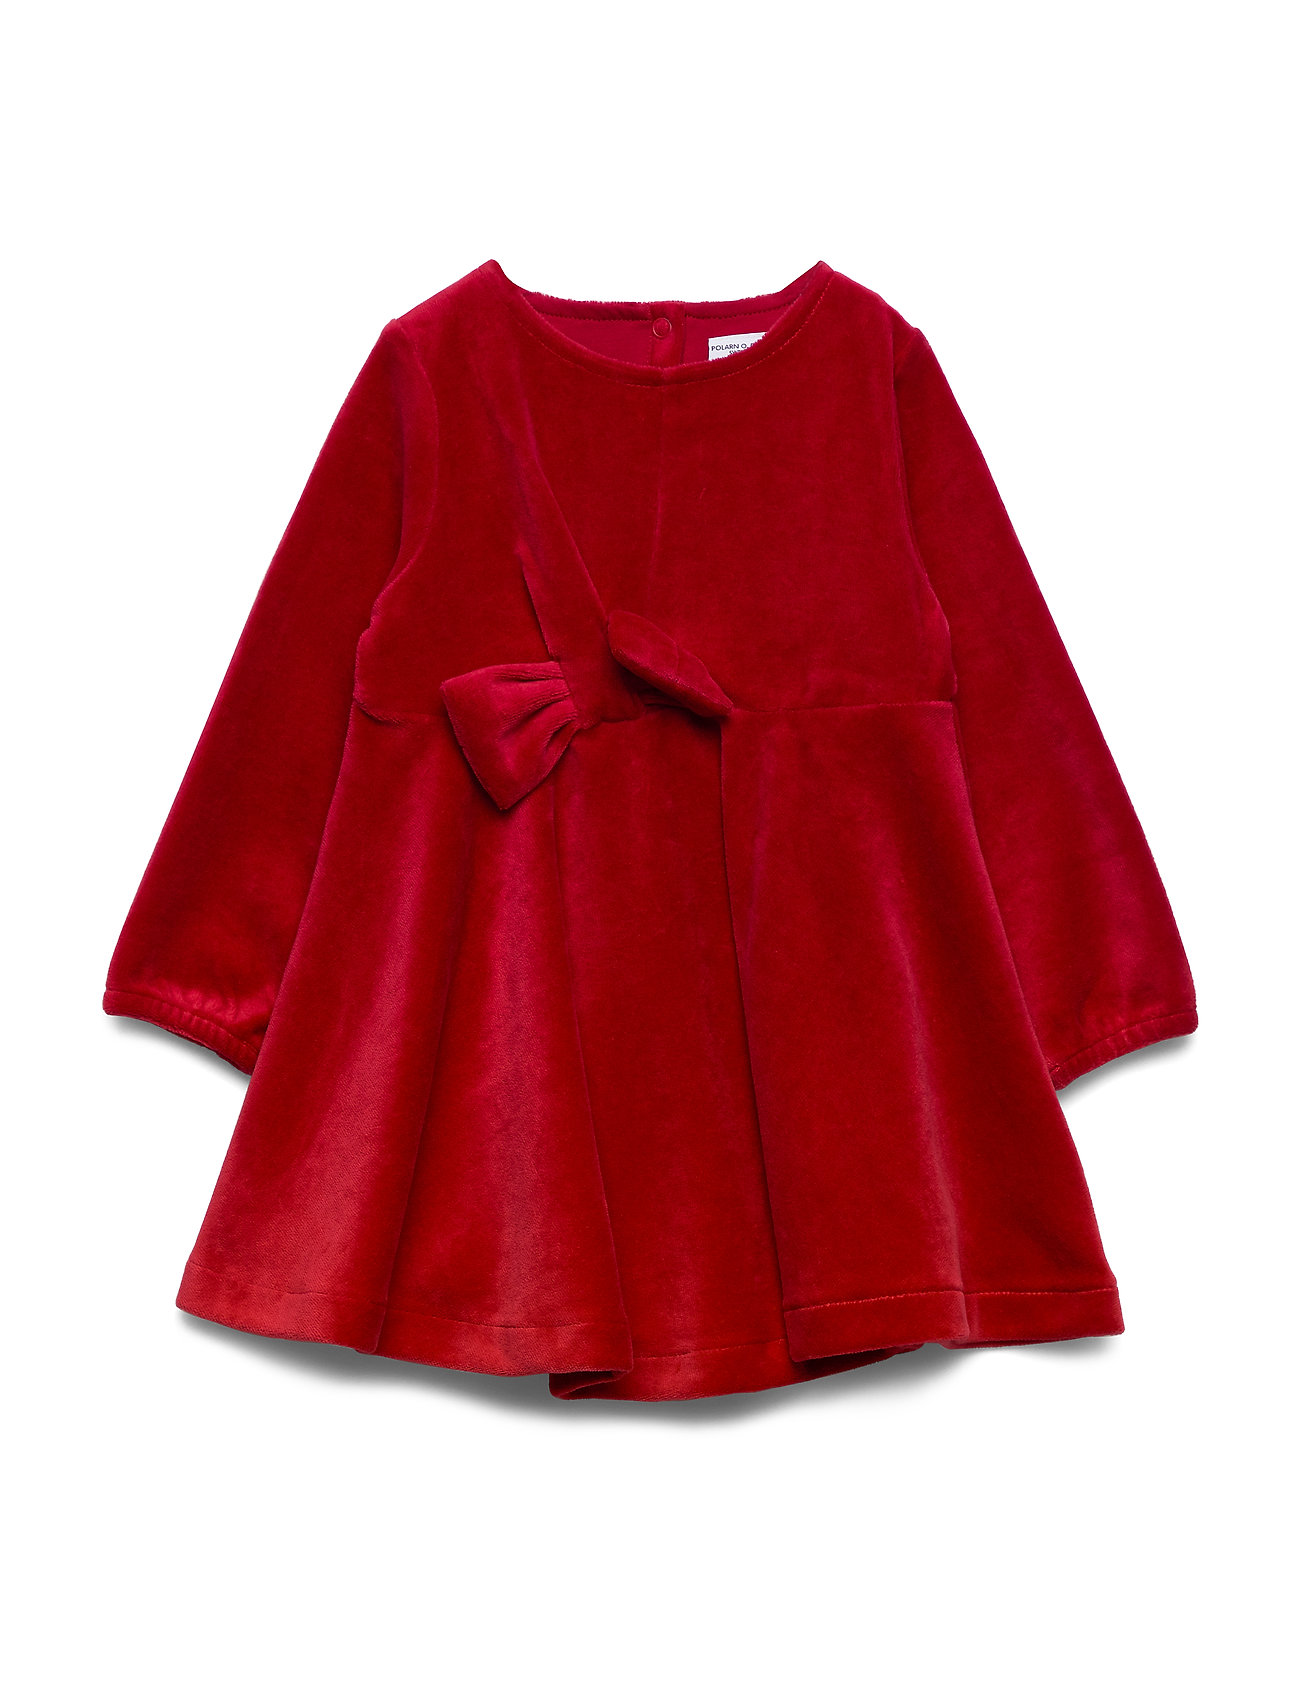 Polarn O. Pyret Dress solid w detail Preschool - CHILI PEPPER